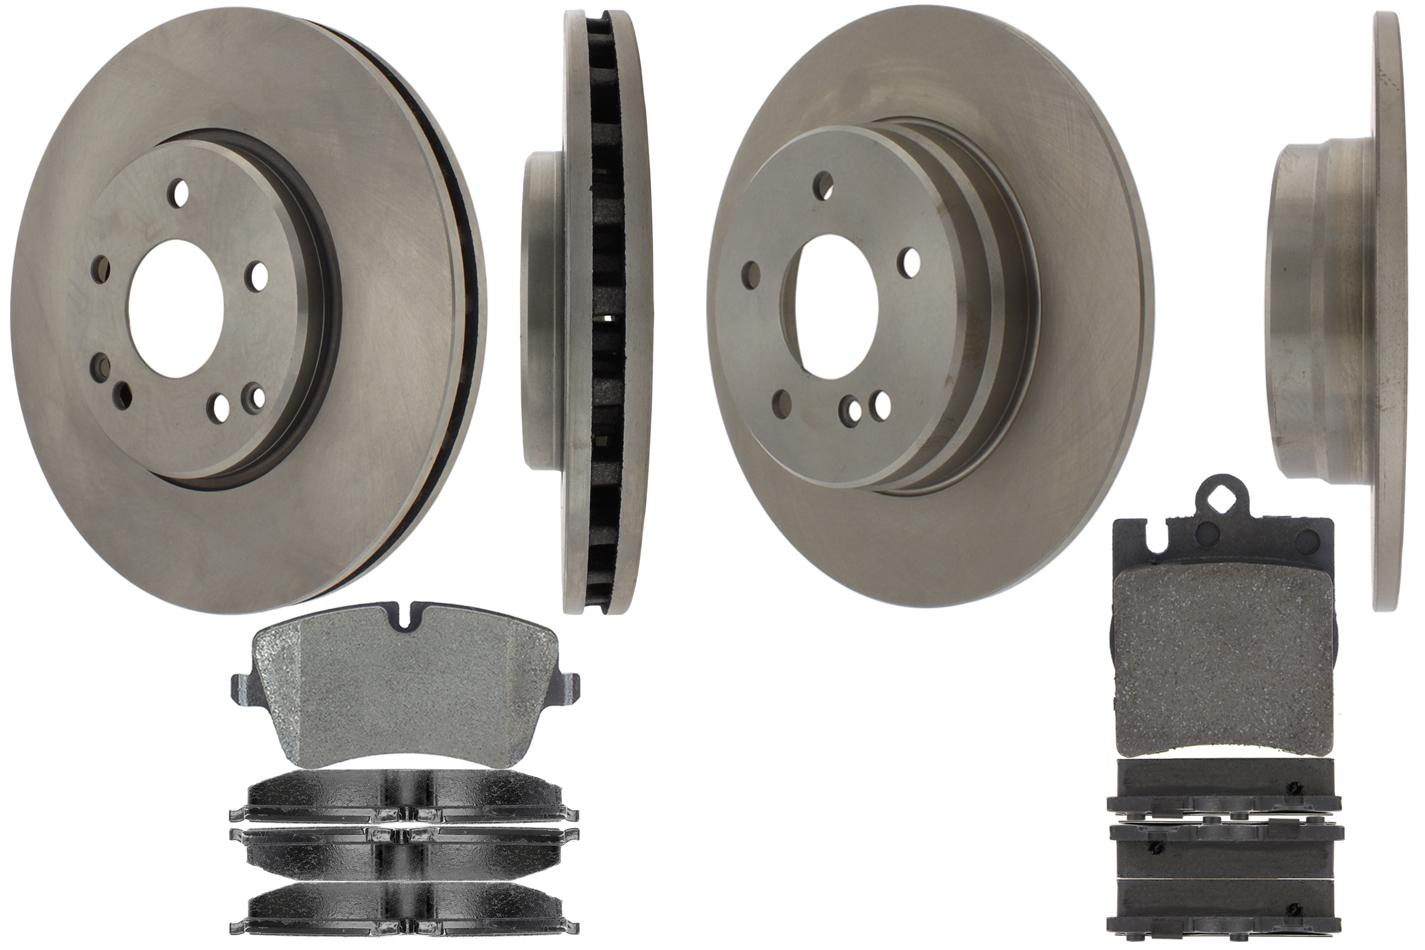 Centric Brake Parts 905.35020 Brake Rotor and Pad Kit, Premium, Semi-Metallic Pads, Iron, Natural, Mercedes-Benz C320 / C230 / C240 / CLK320 / C280 / CLK350, Kit